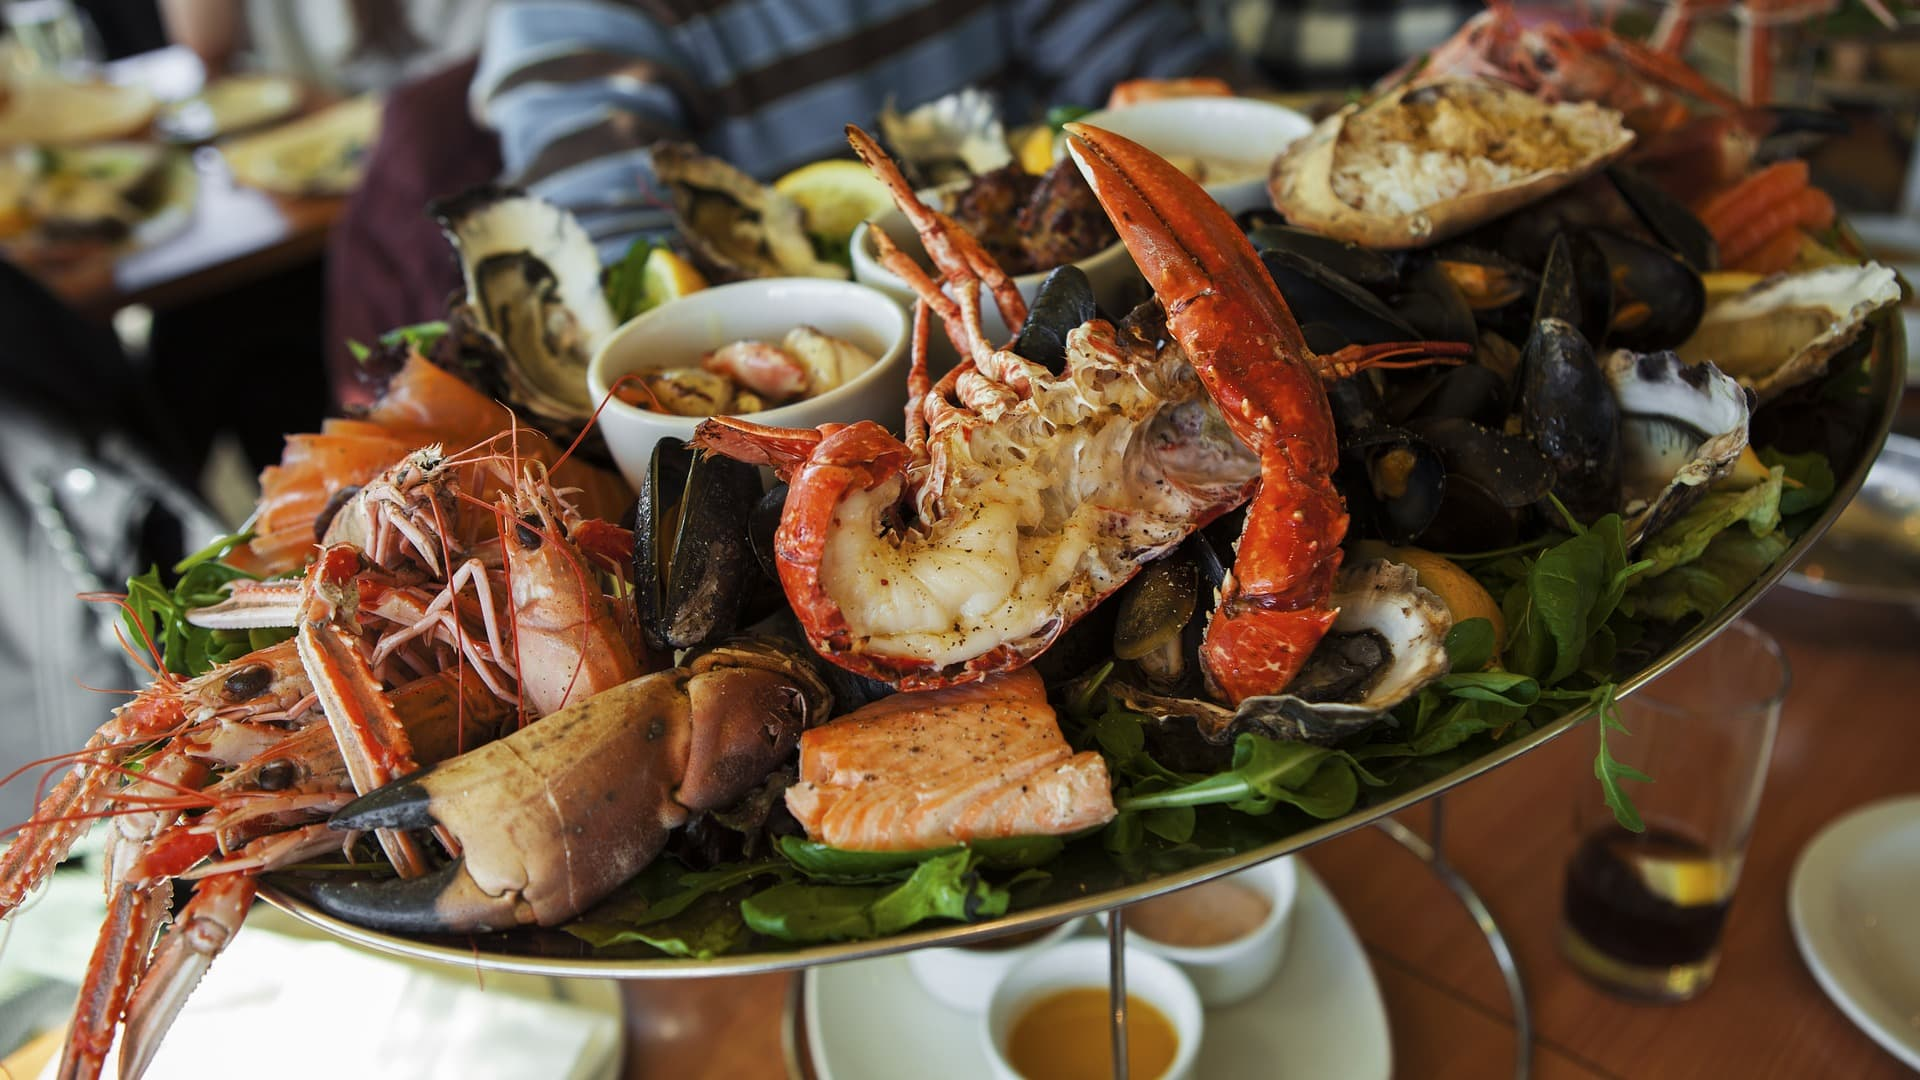 Best restaurants in Nusa Lembongan - 10 Unmissable Things To Do In Nusa Lembongan & Nusa Ceningan